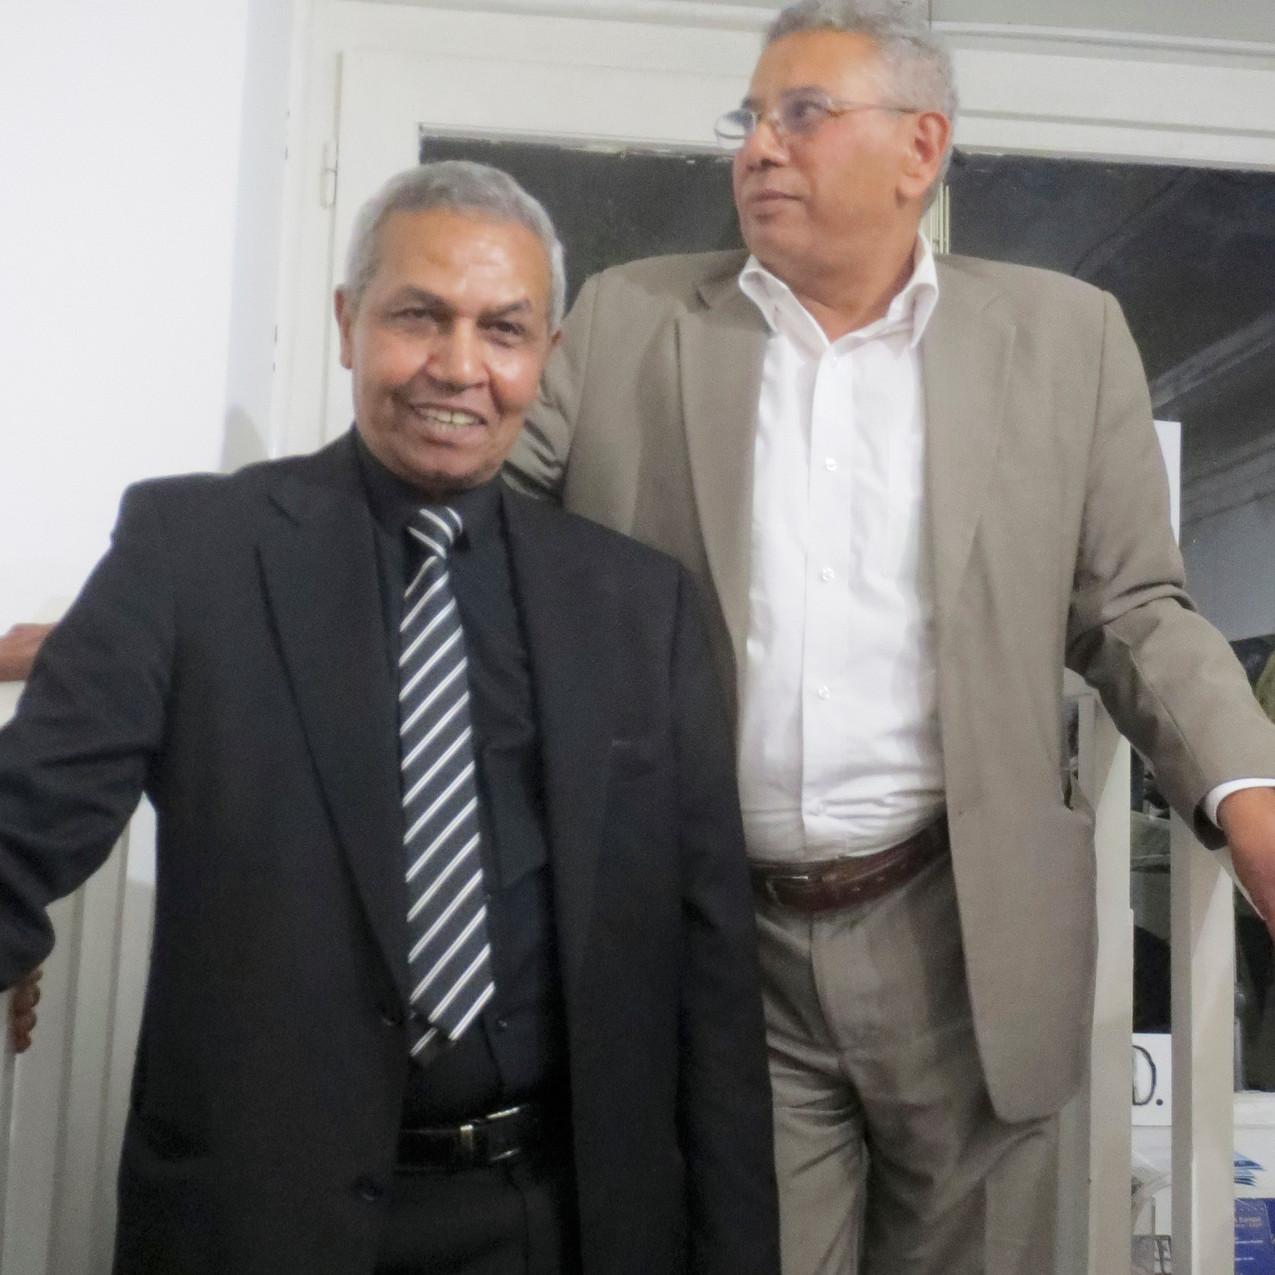 mohamed azzam (l.) & hassan baroud (r.)